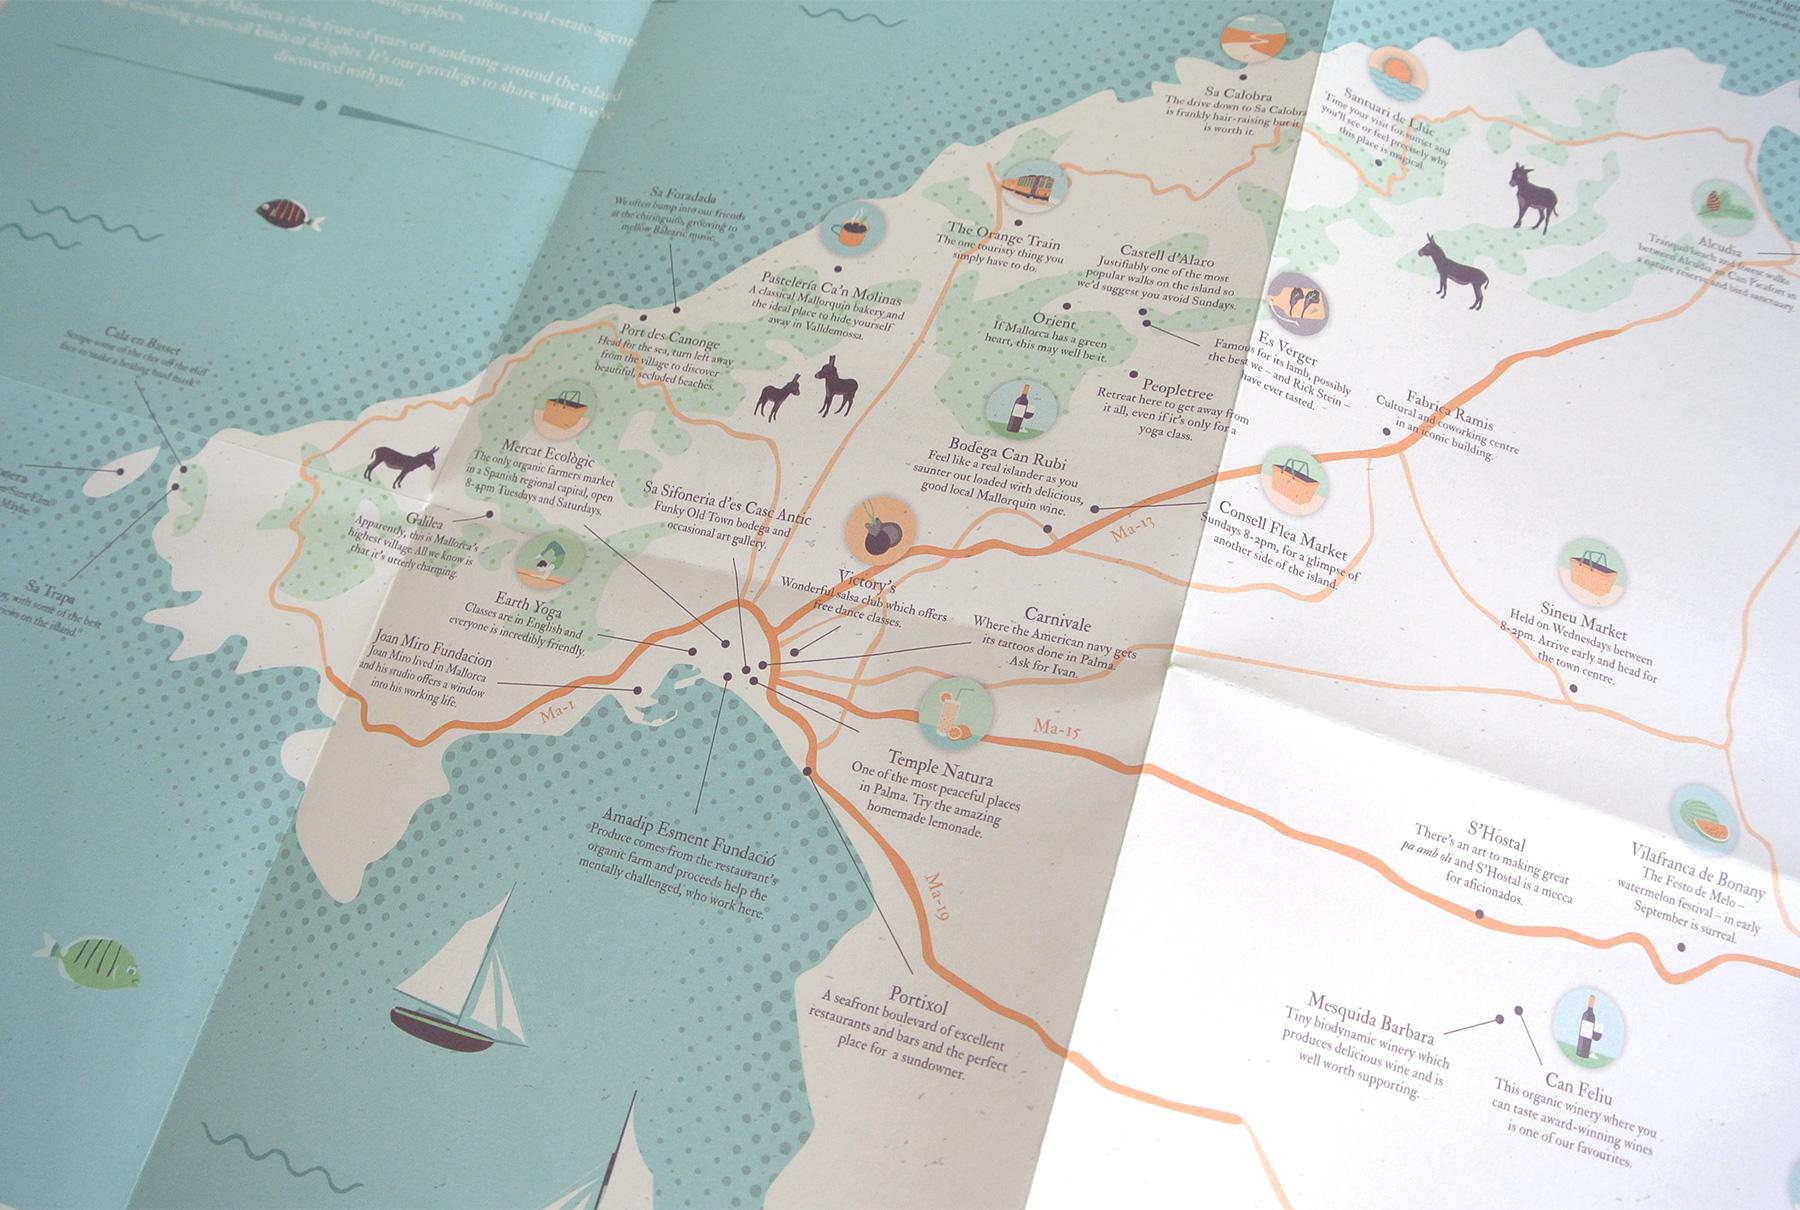 Carole_Chevalier-Map-Charles-Marlow-2.jpg